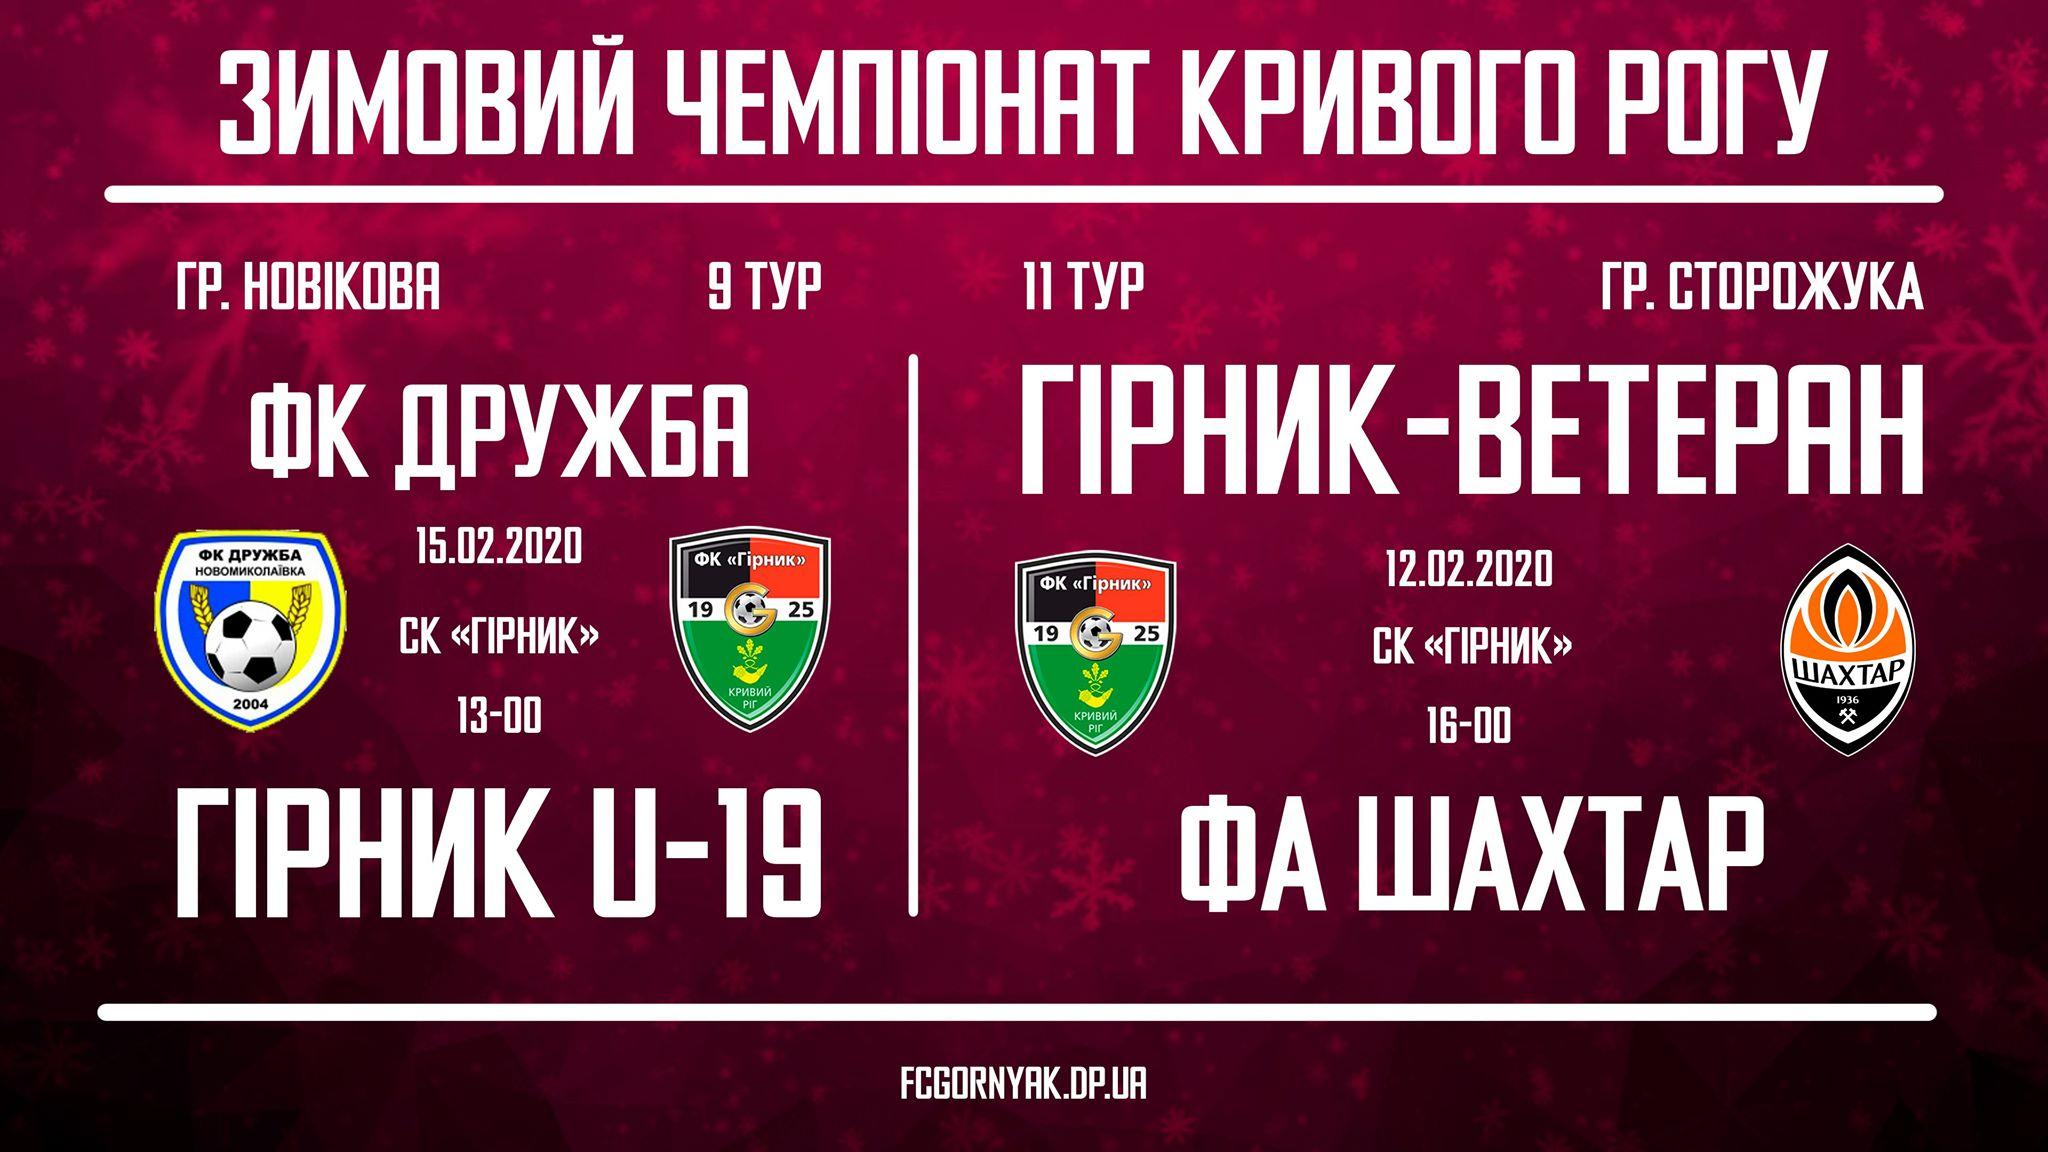 Зимний чемпионат Кривого Рога. 9, 11 туры: детали матчей